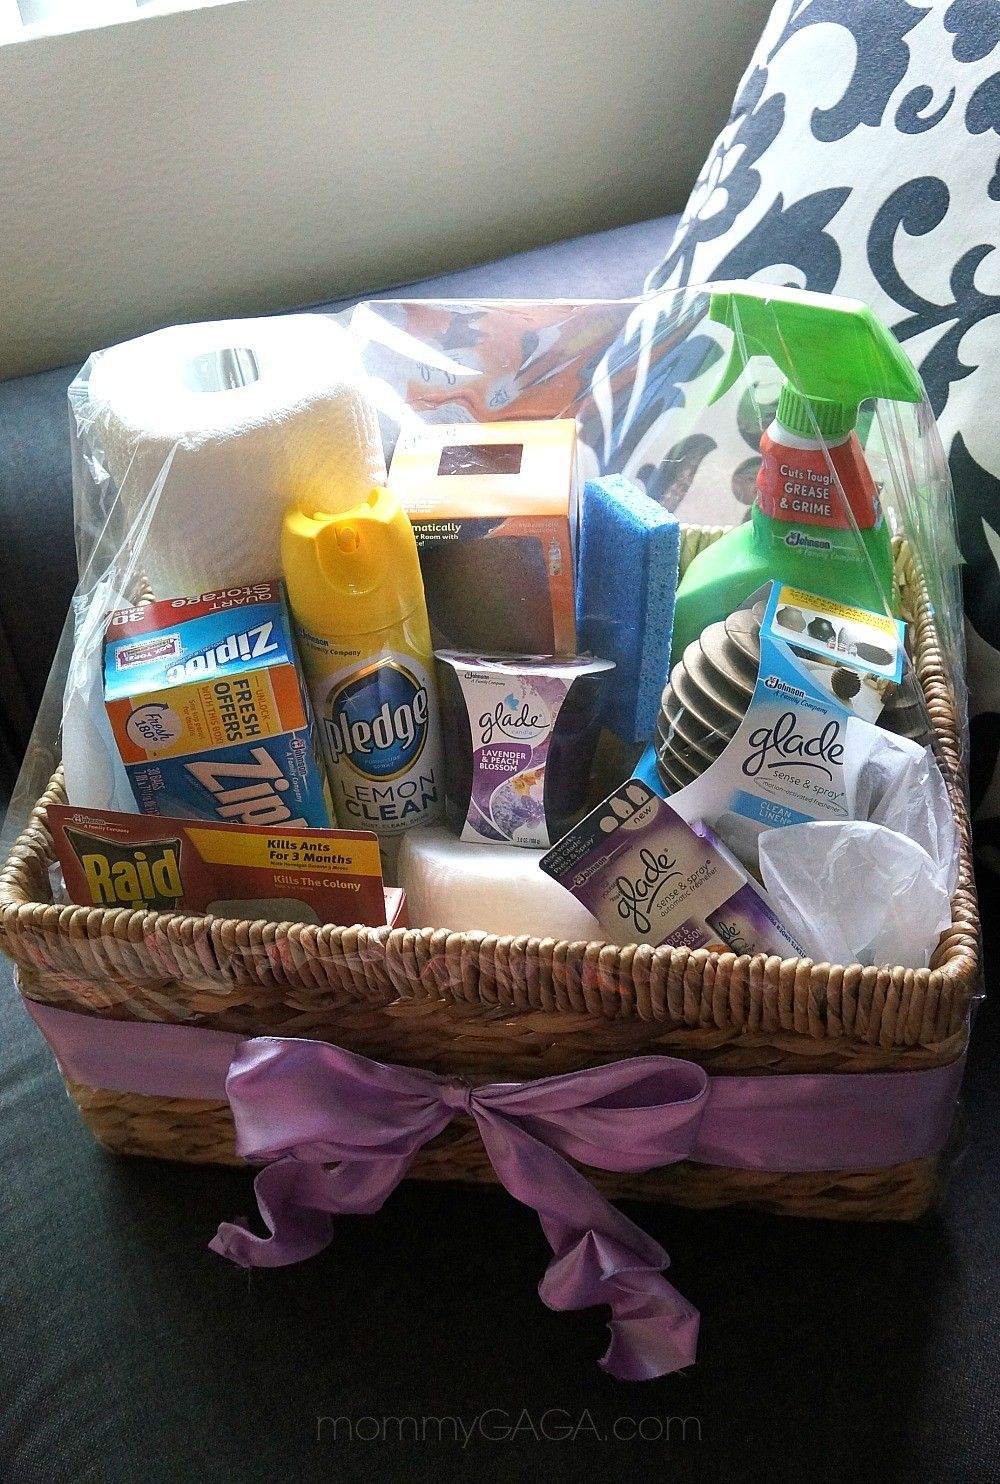 diy housewarming gift ideas: make a diy home essentials gift basket